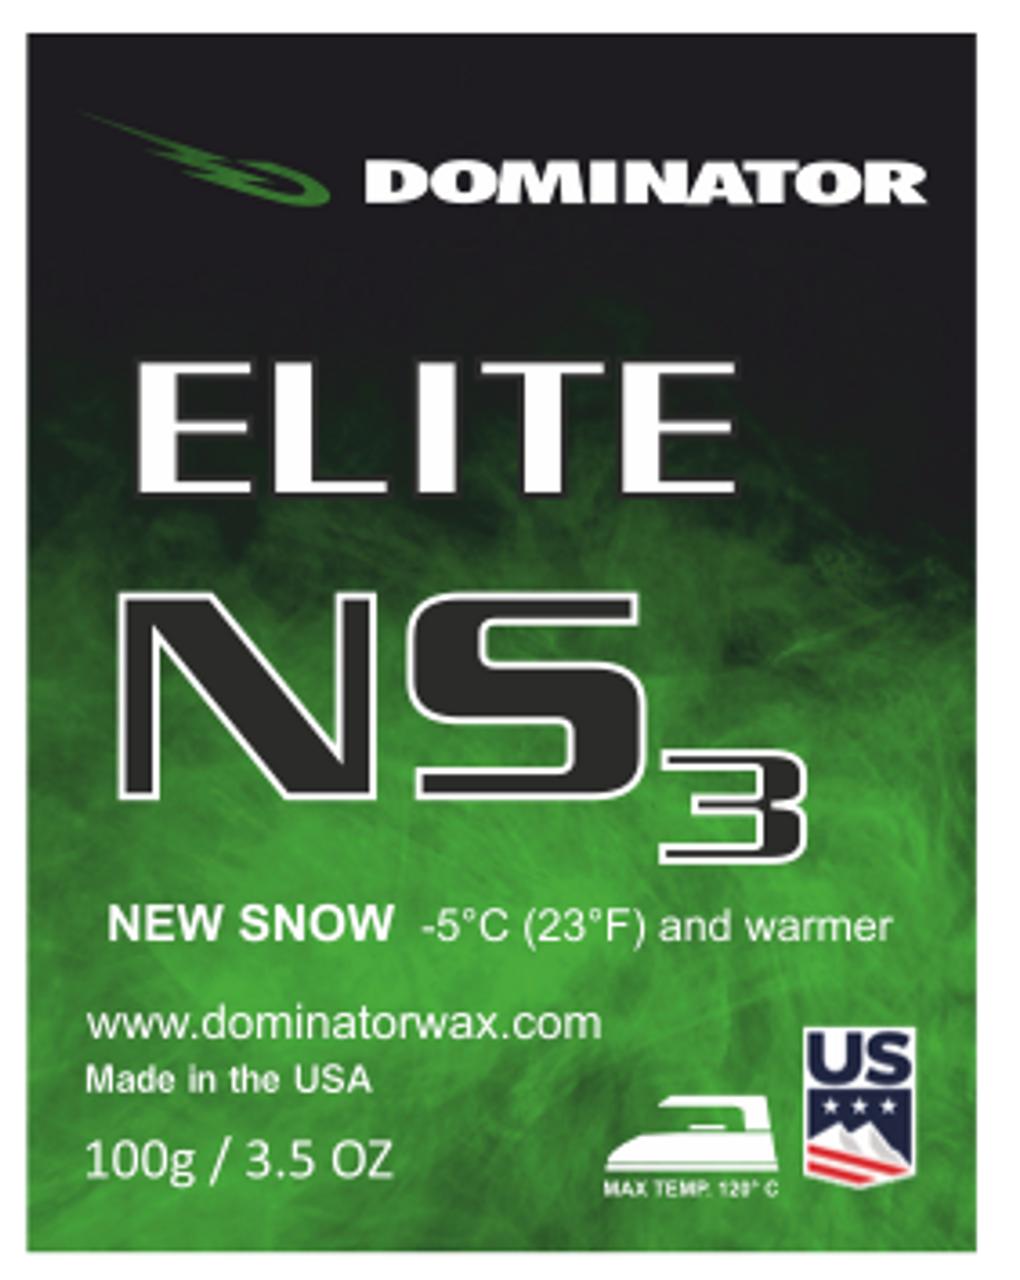 Dominator Elite Wax New Snow NS3